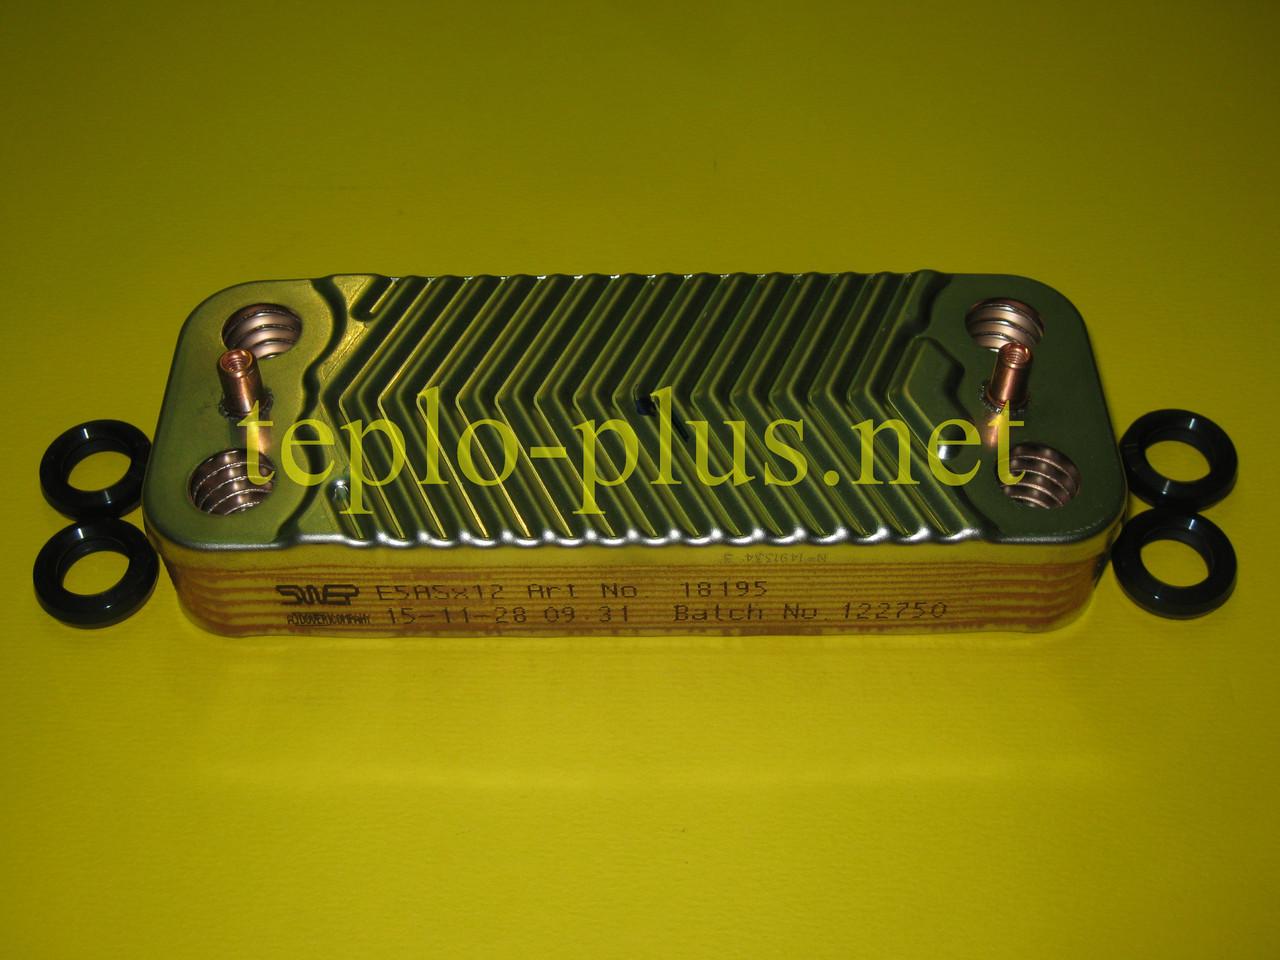 Теплообменник вторичный 3.021692 Immergas Nike Mini 24 3E, Eolo Mini 24 3E